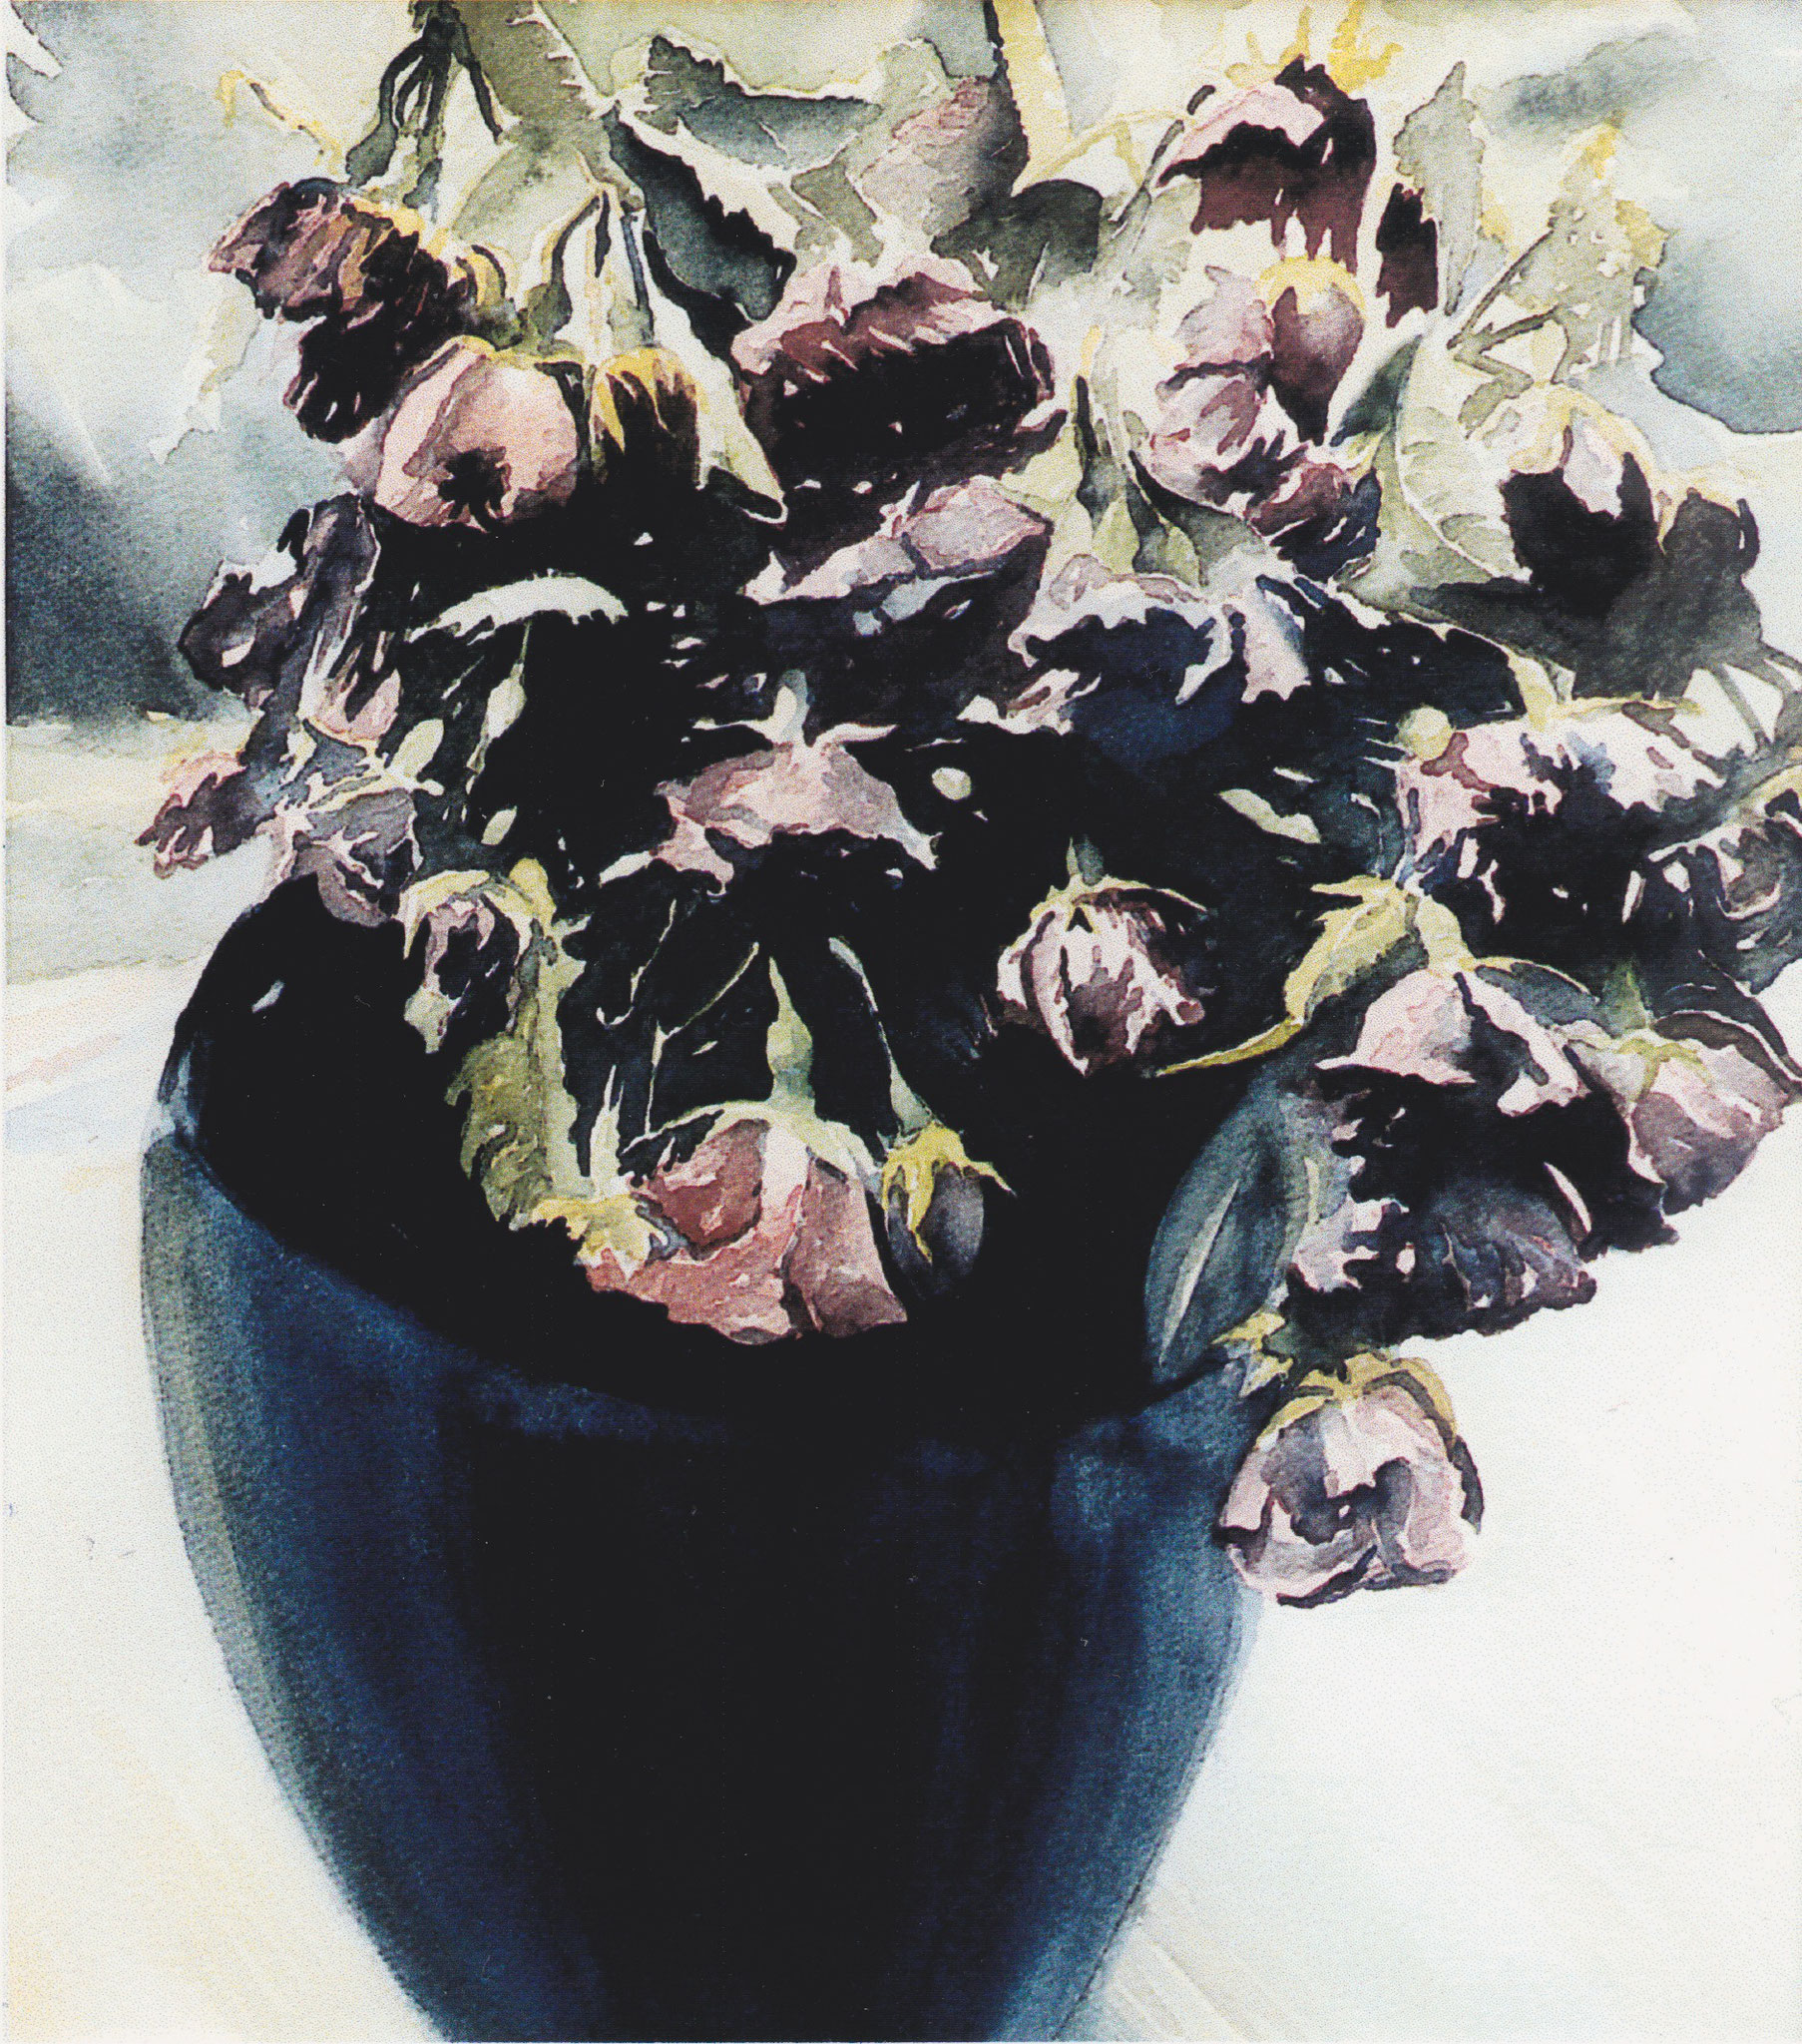 ' Rosentod ' Aquarell, 40 x 30 cm, 1996